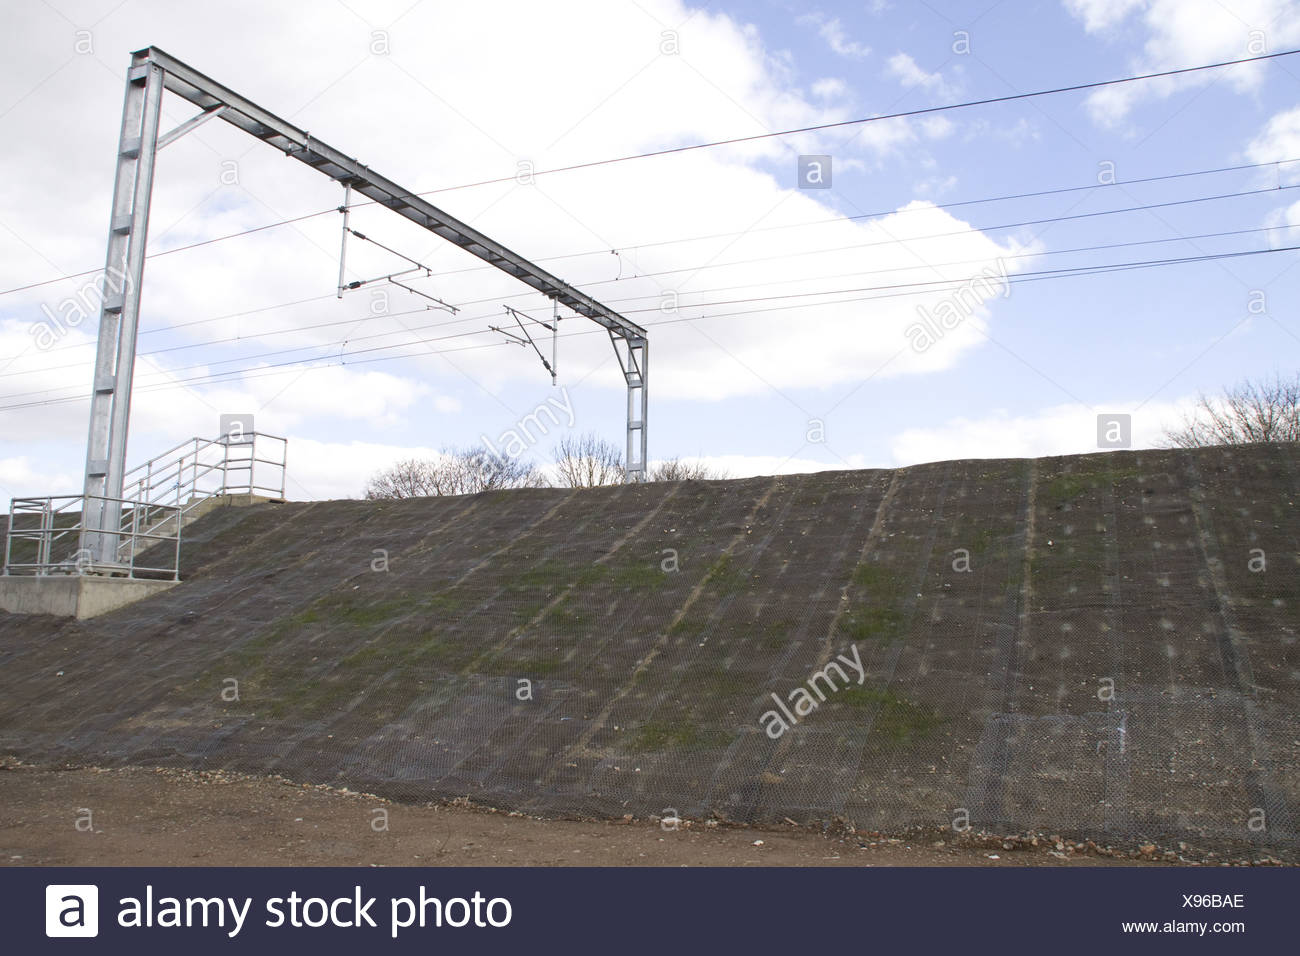 Railway embankment wit matt netting used controle Stock Photo